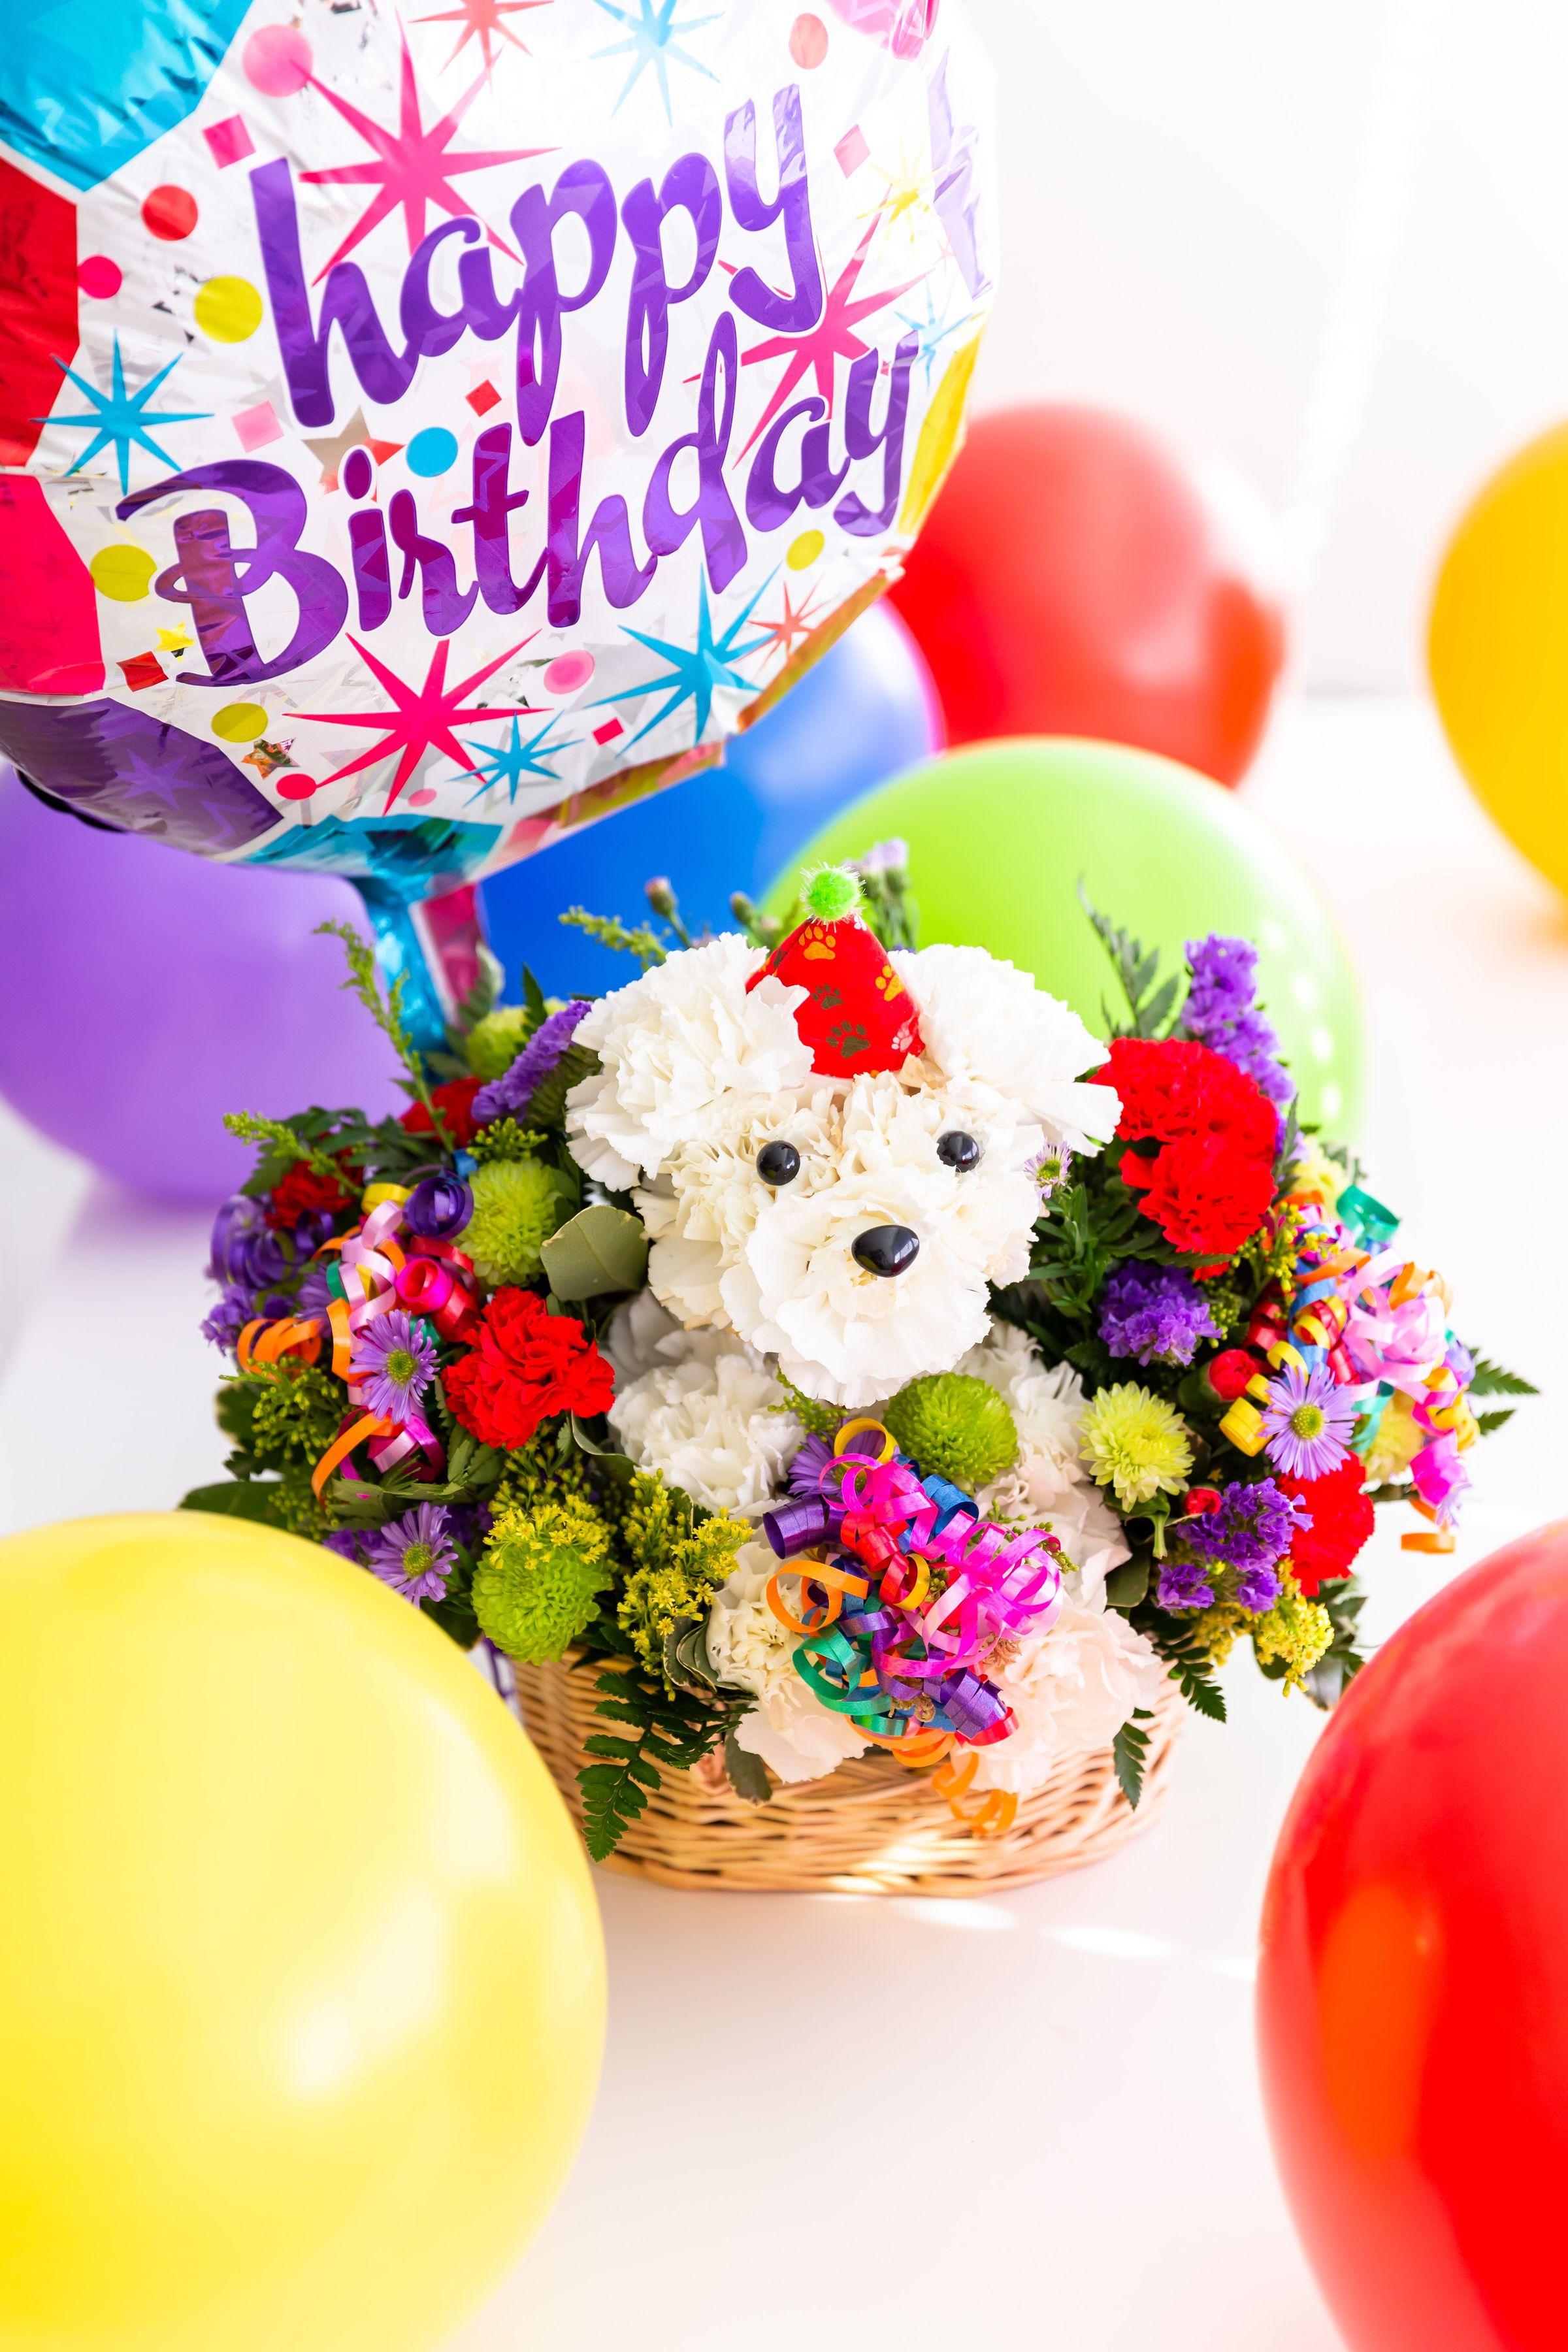 100 Birthday Flowers Gifts Ideas In 2020 Birthday Flowers Birthday Flower Gift